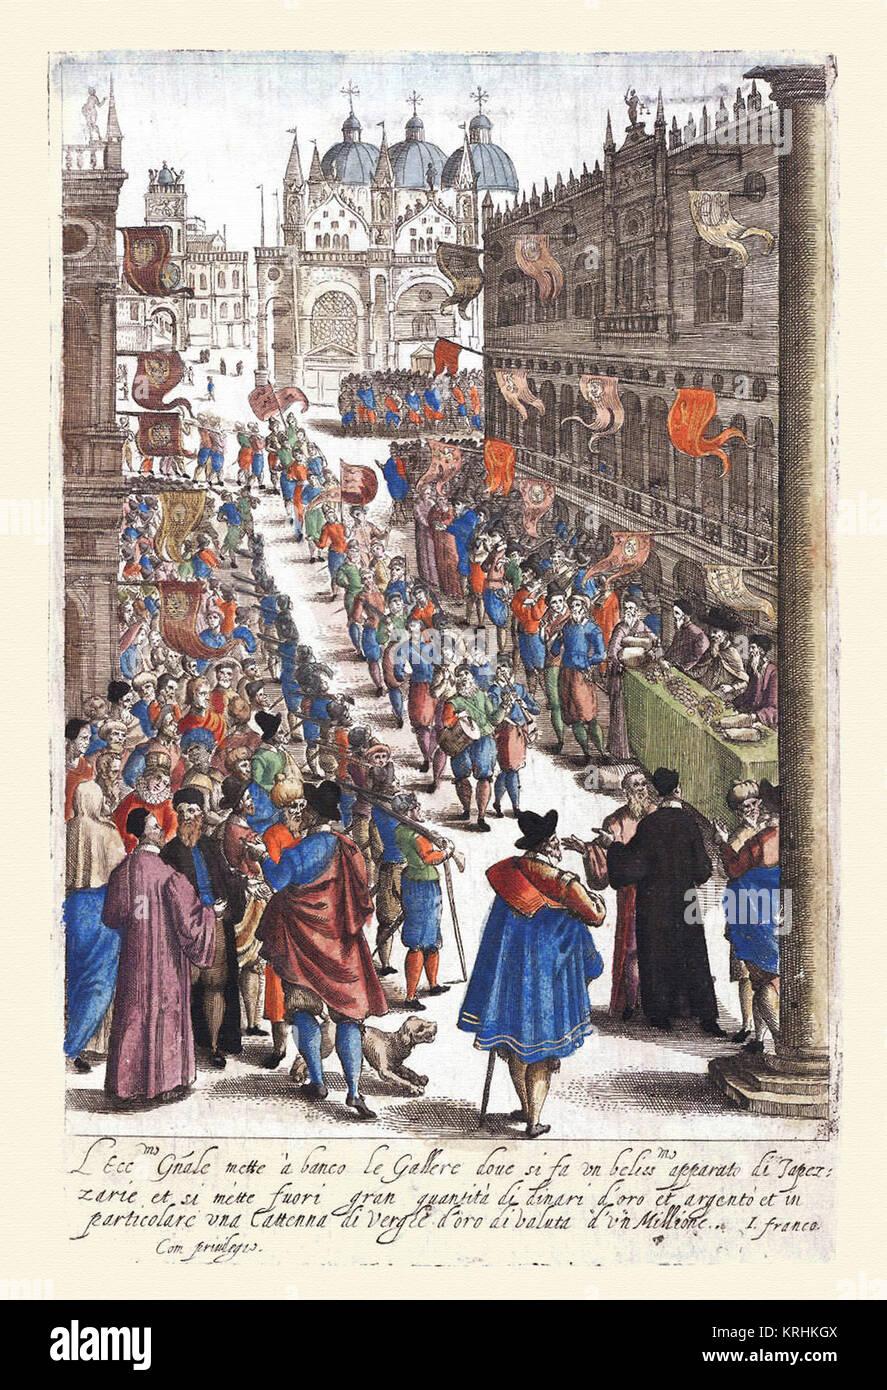 Desfile & fiesta veneciana-Habiti d'hvomeni et donne venetiane 1609 - Stock Image